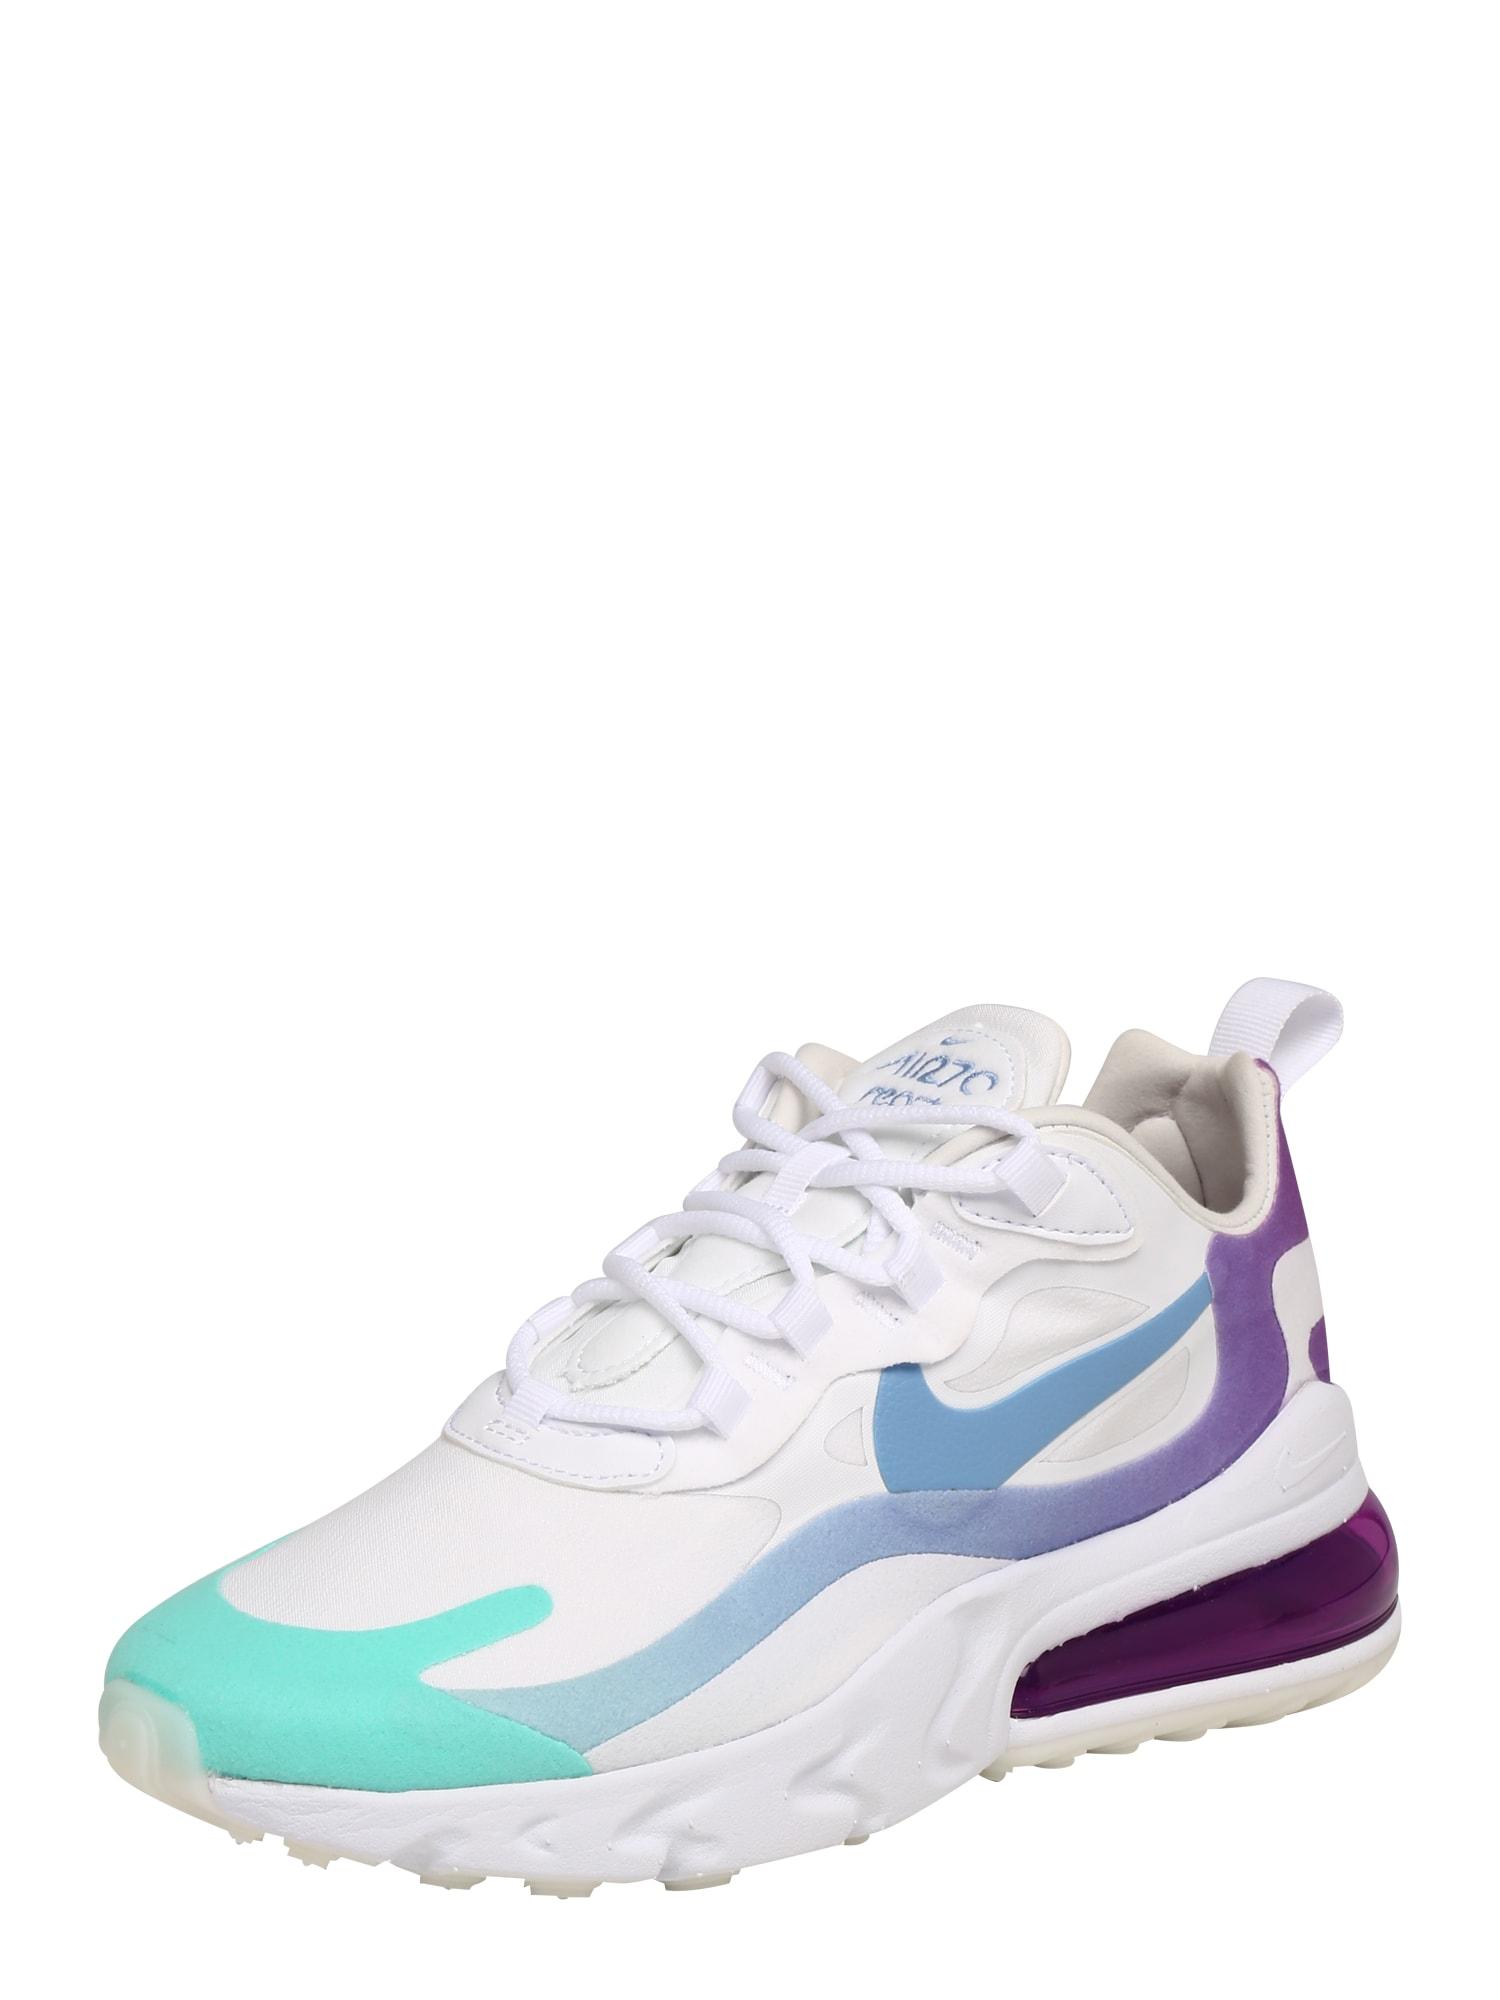 Nike Sportswear Sportbačiai be auliuko 'AIR MAX 270 REACT' mėlyna / žalia / balta